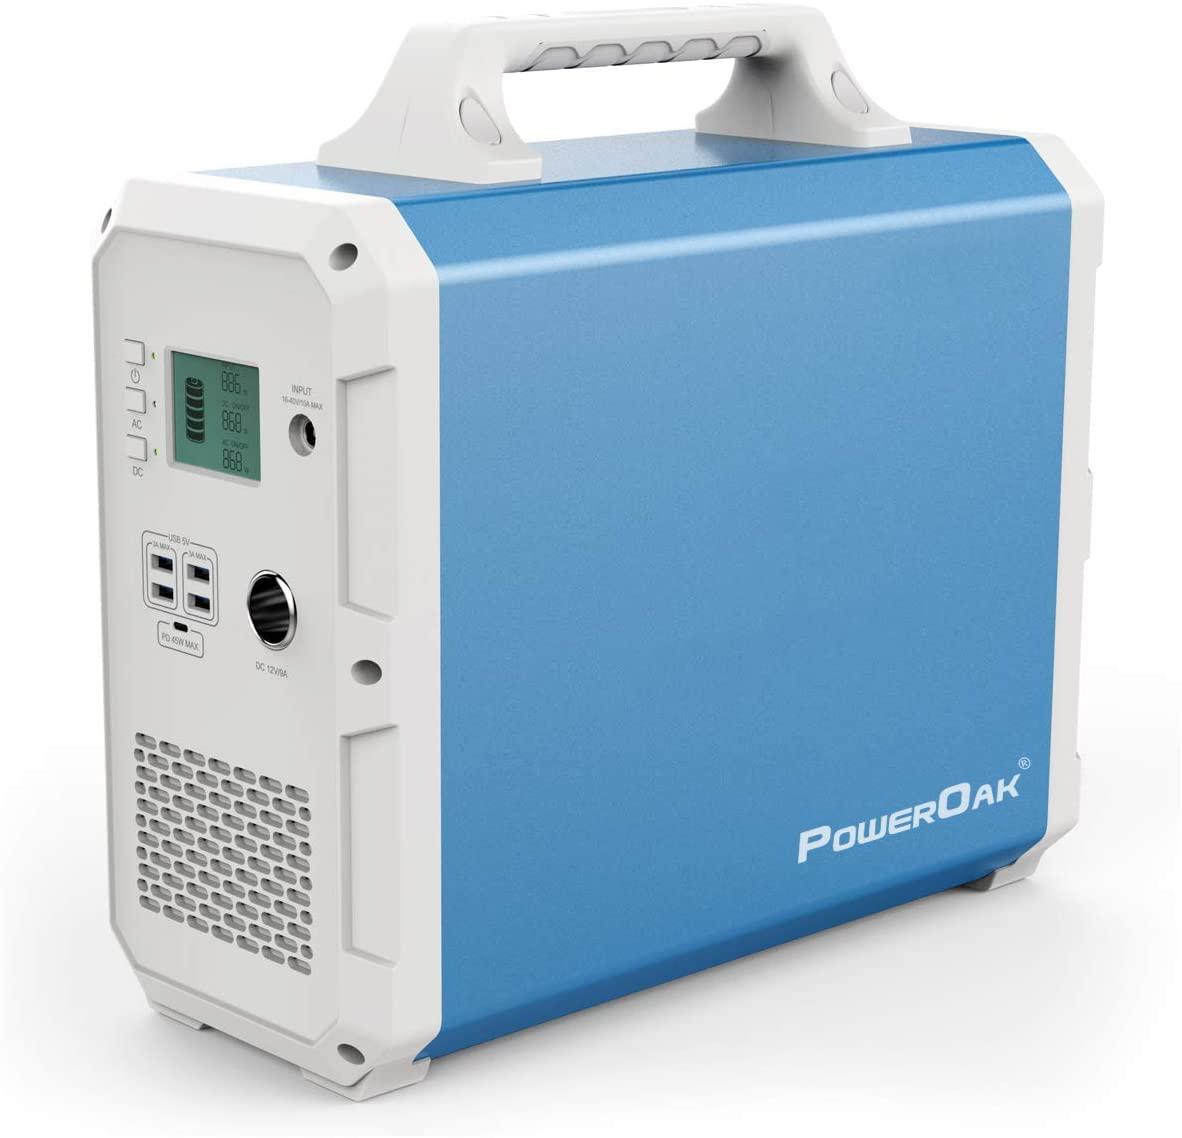 PowerOak Portable Solar Generator